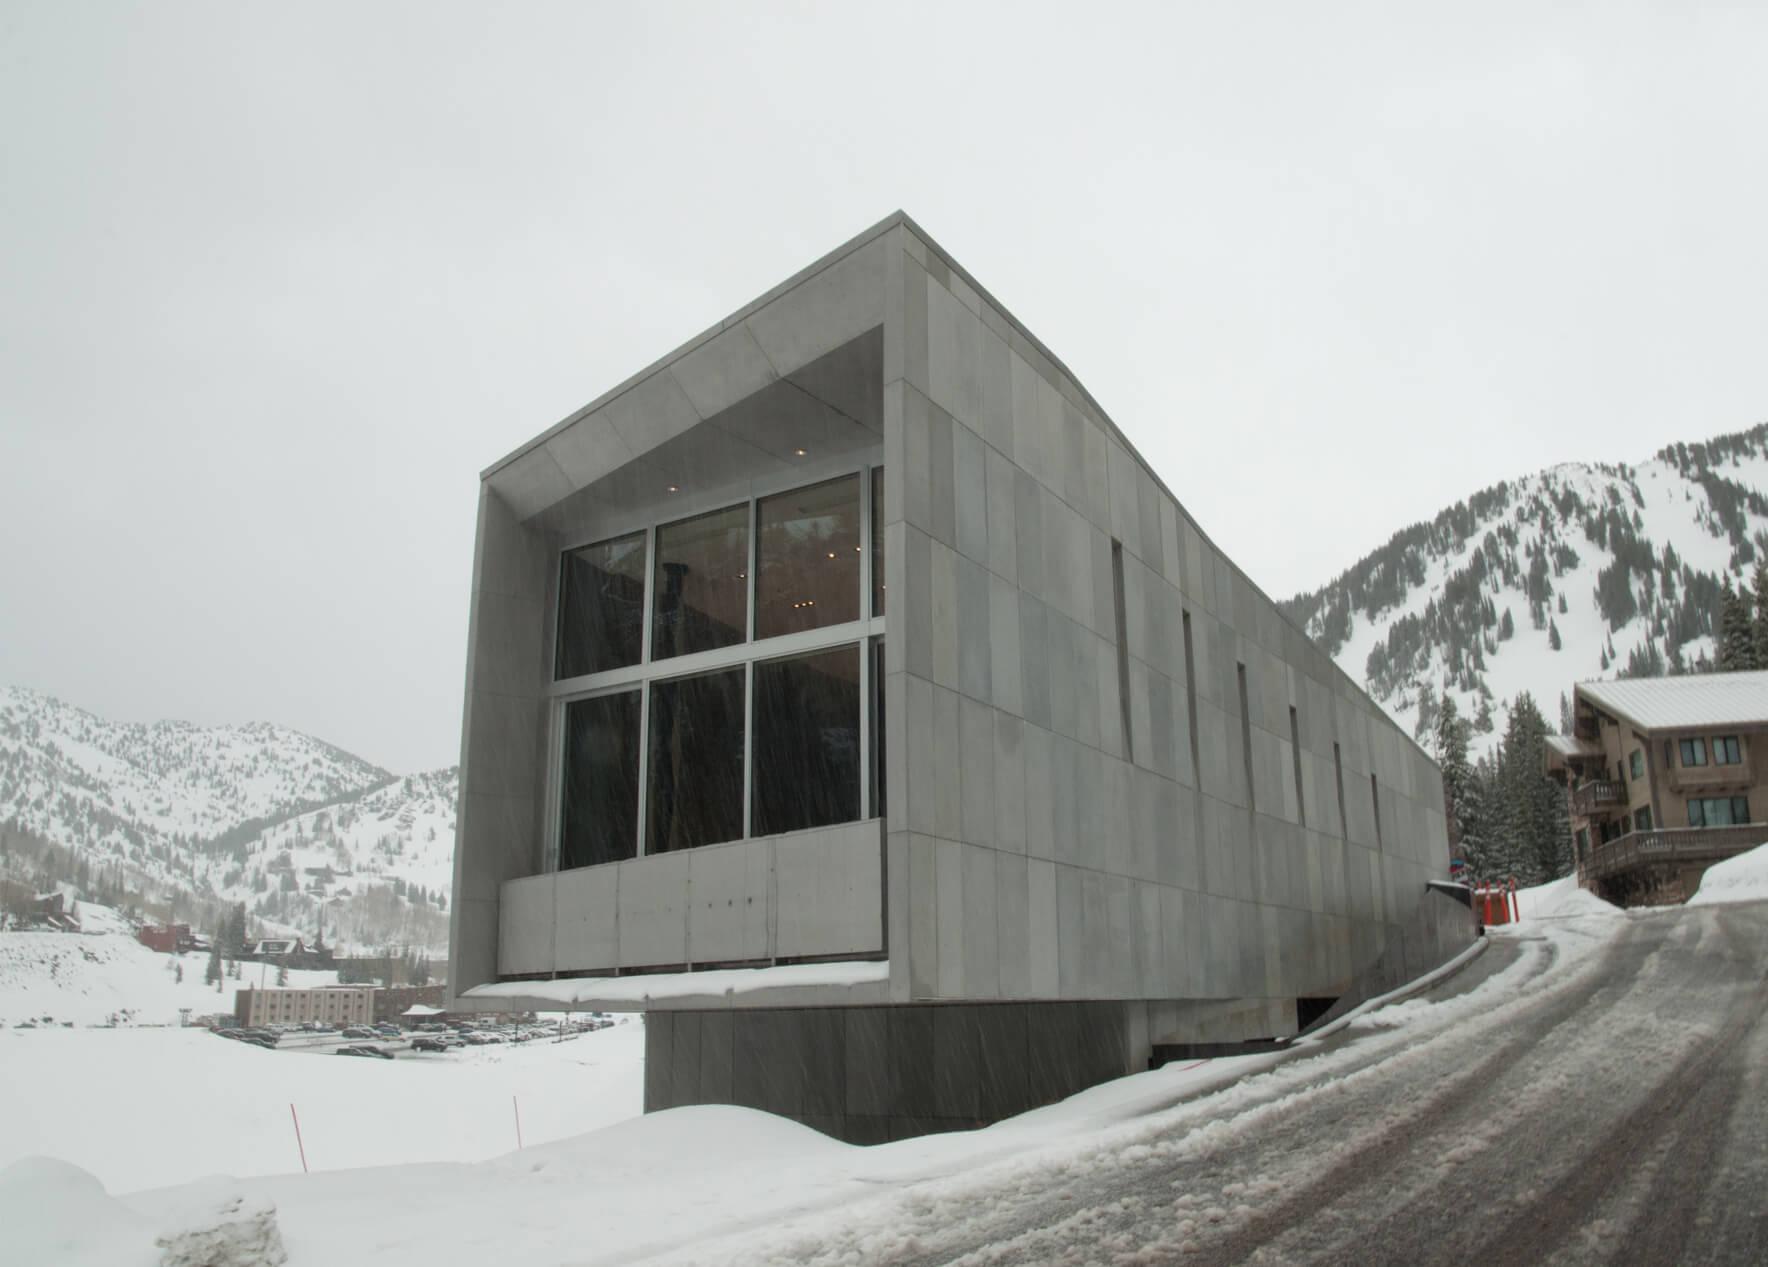 Ski house alta utah dhd architecture interior design for Utah home design architects